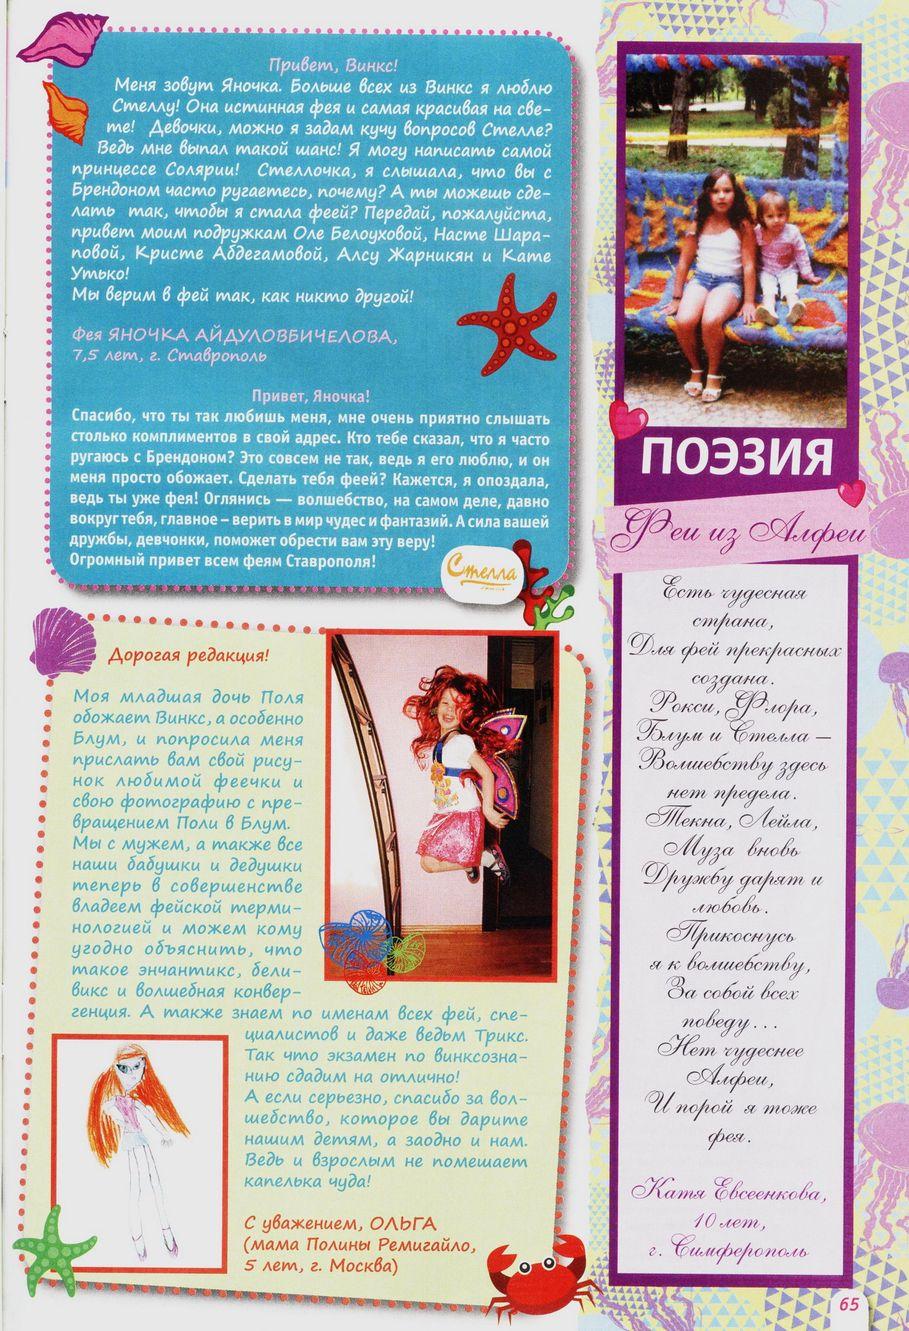 Комикс Винкс Winx - Волшебник Камуд (Журнал Винкс №6 2011) - стр. 65